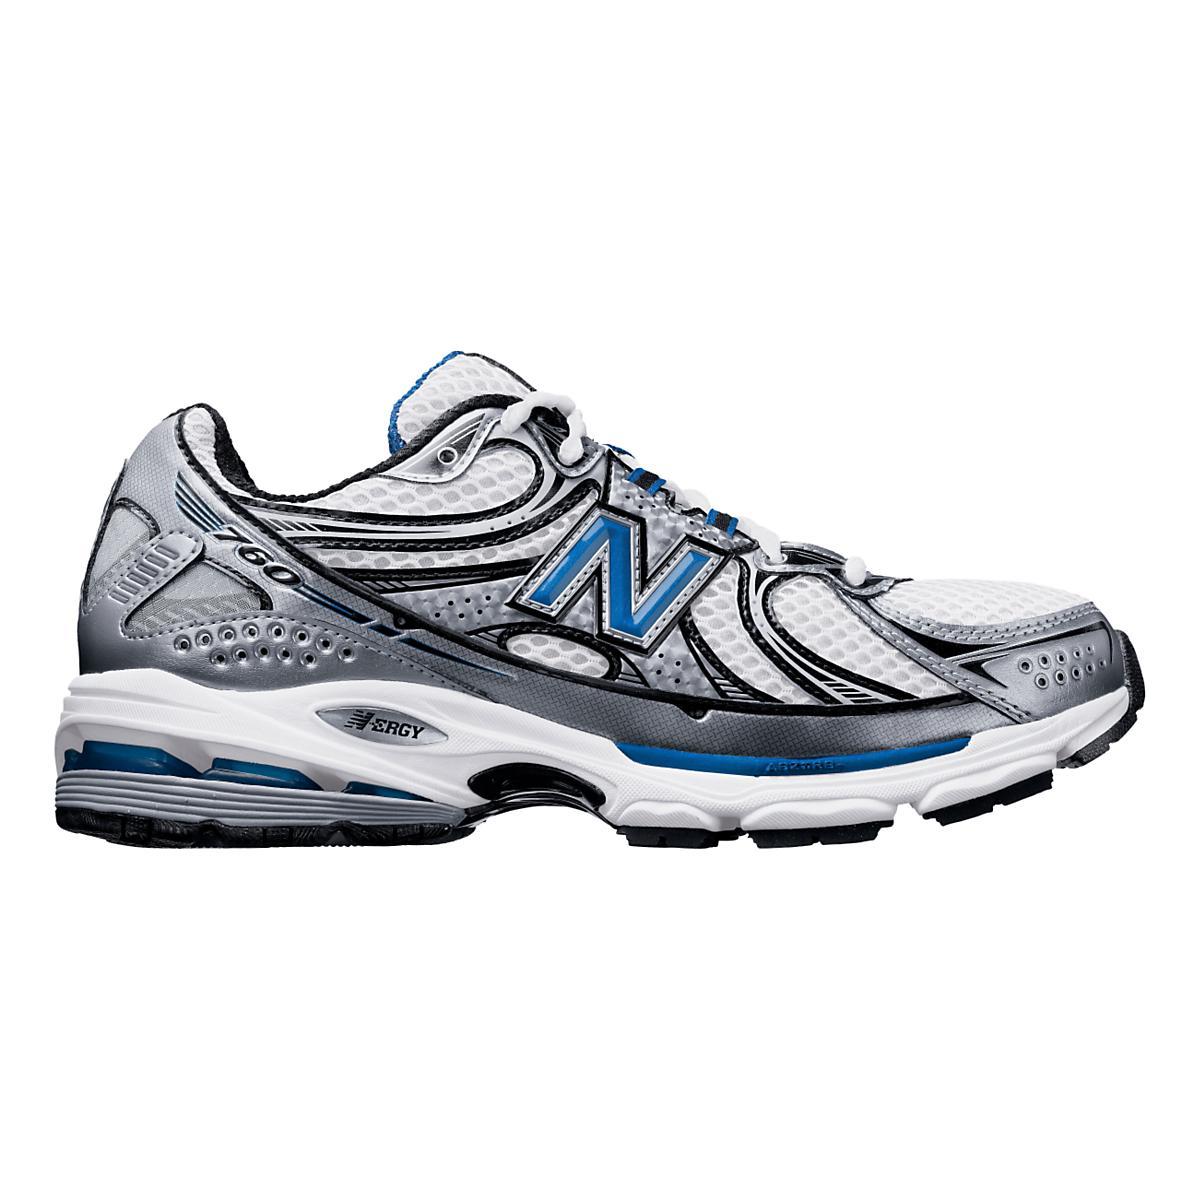 45ab5c62c763 Mens New Balance 760 Running Shoe at Road Runner Sports